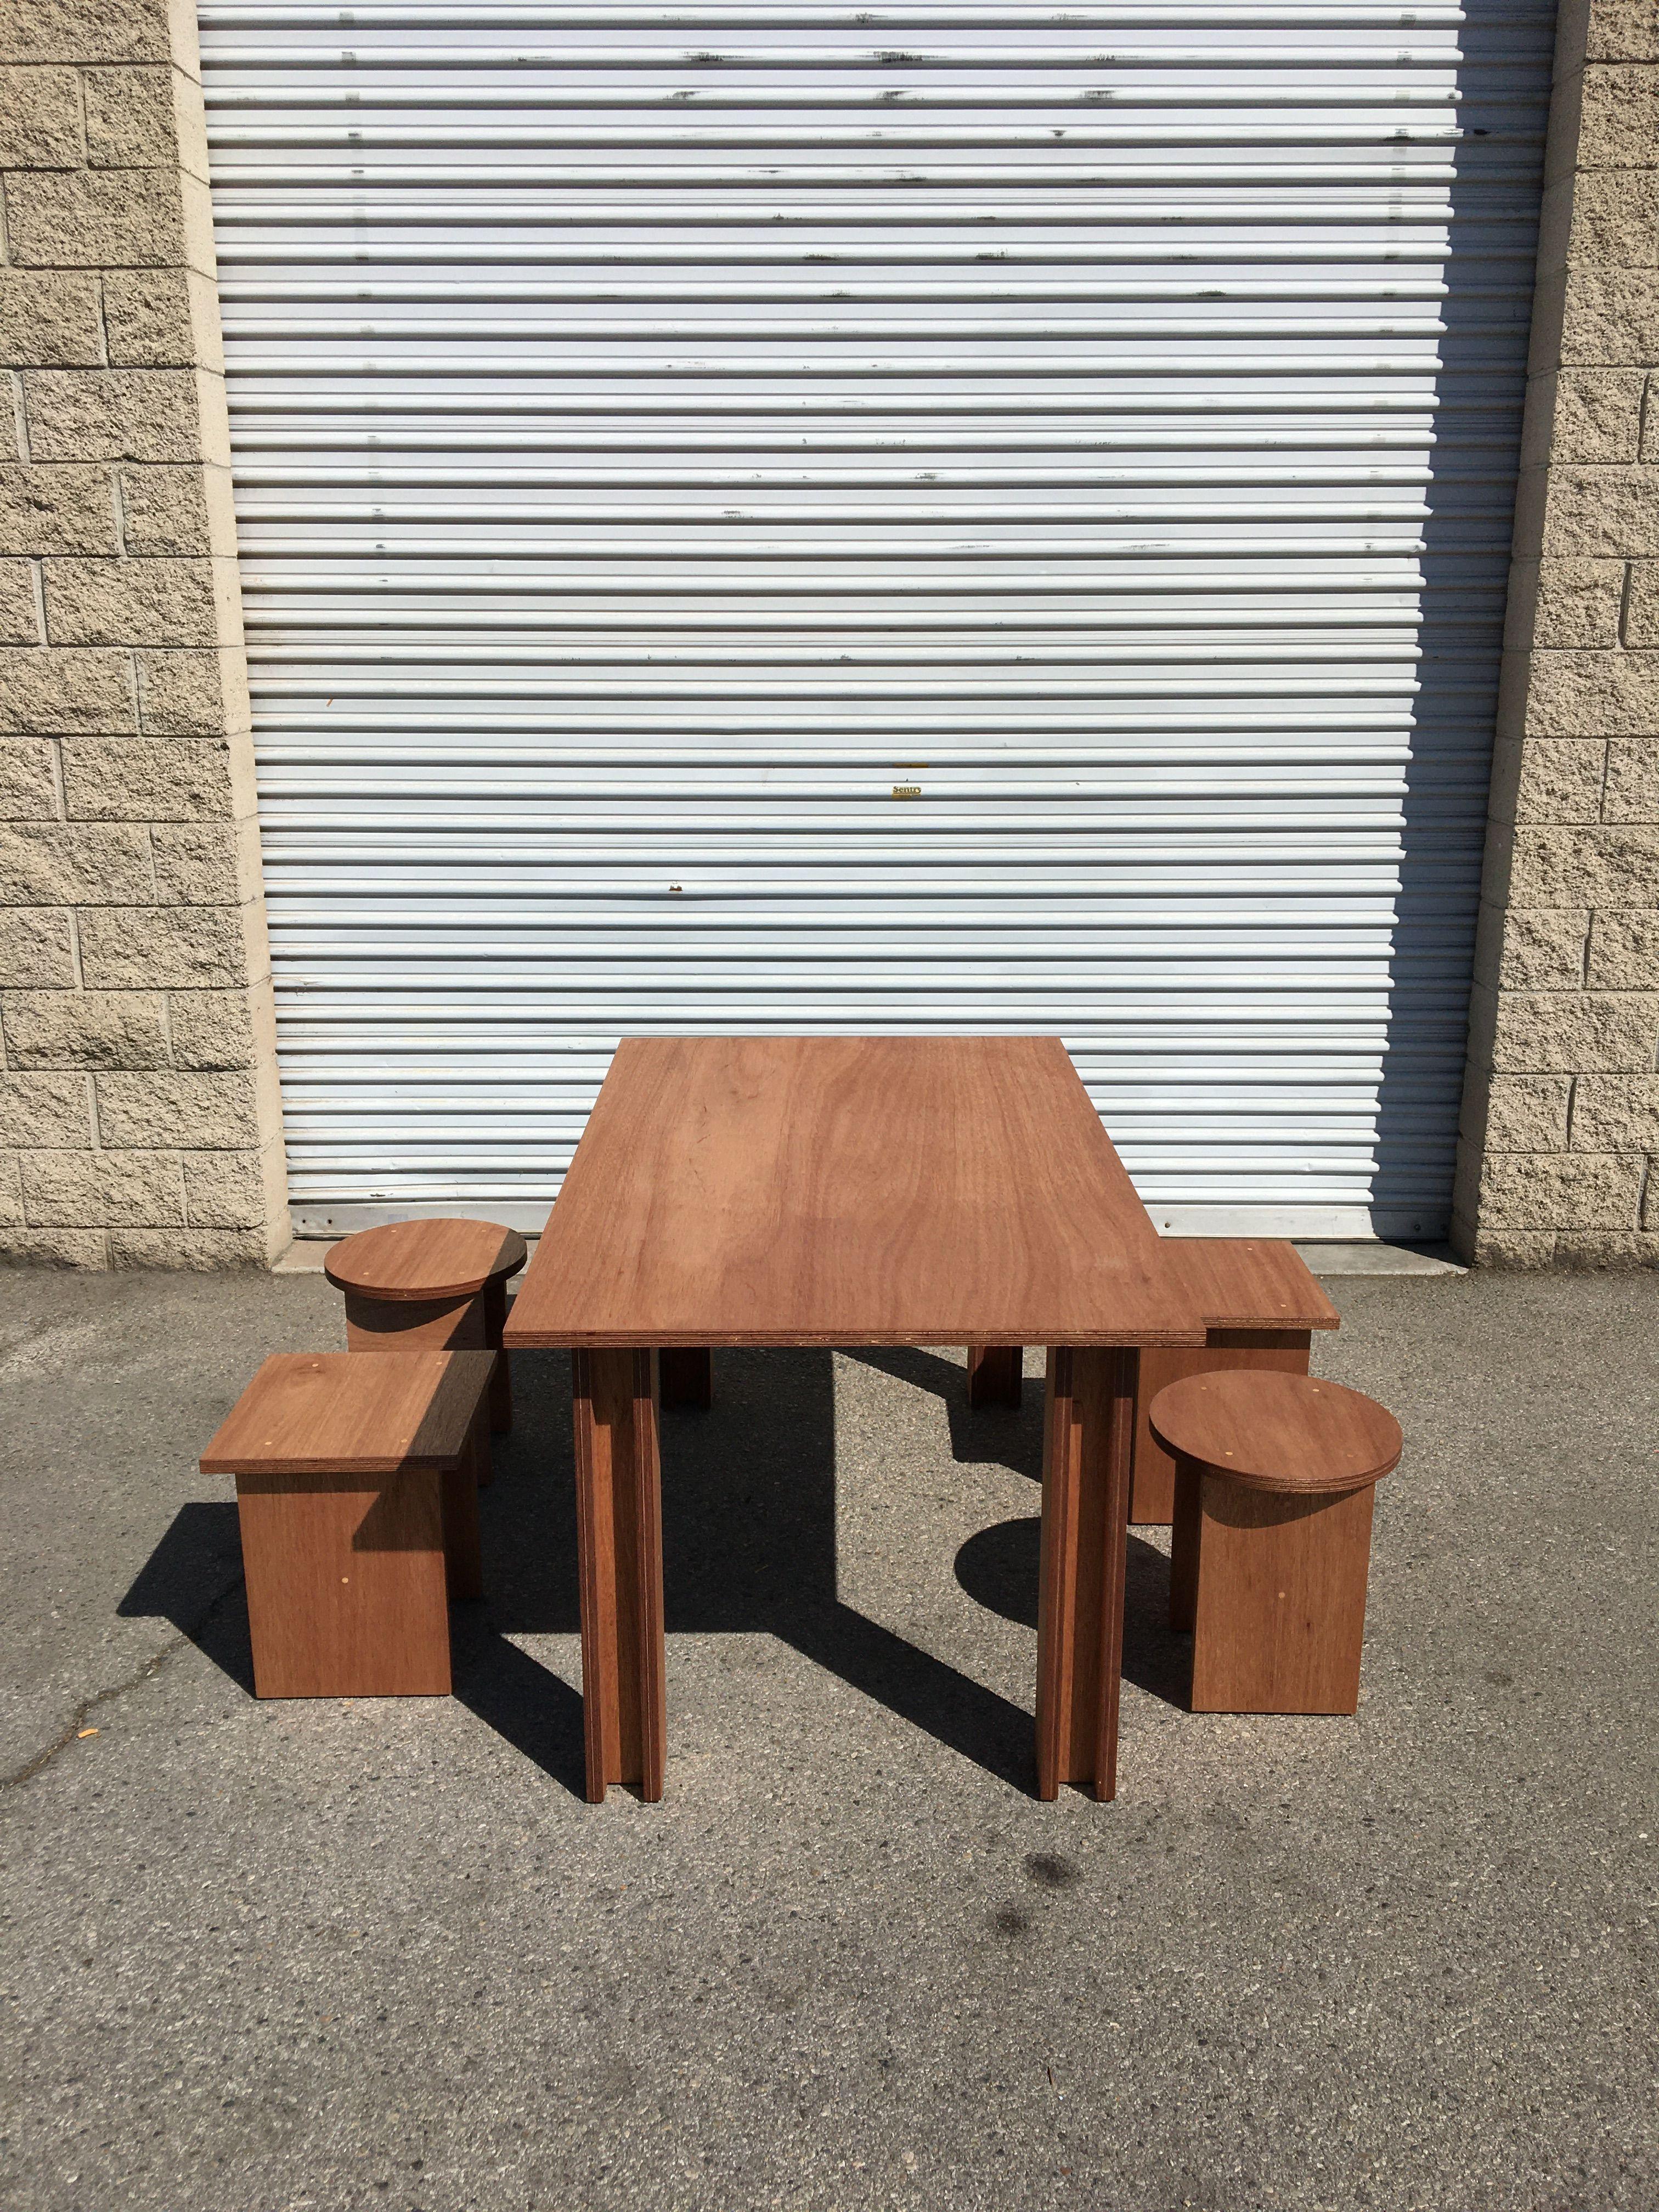 Outdoor I-Beam Set product image 8